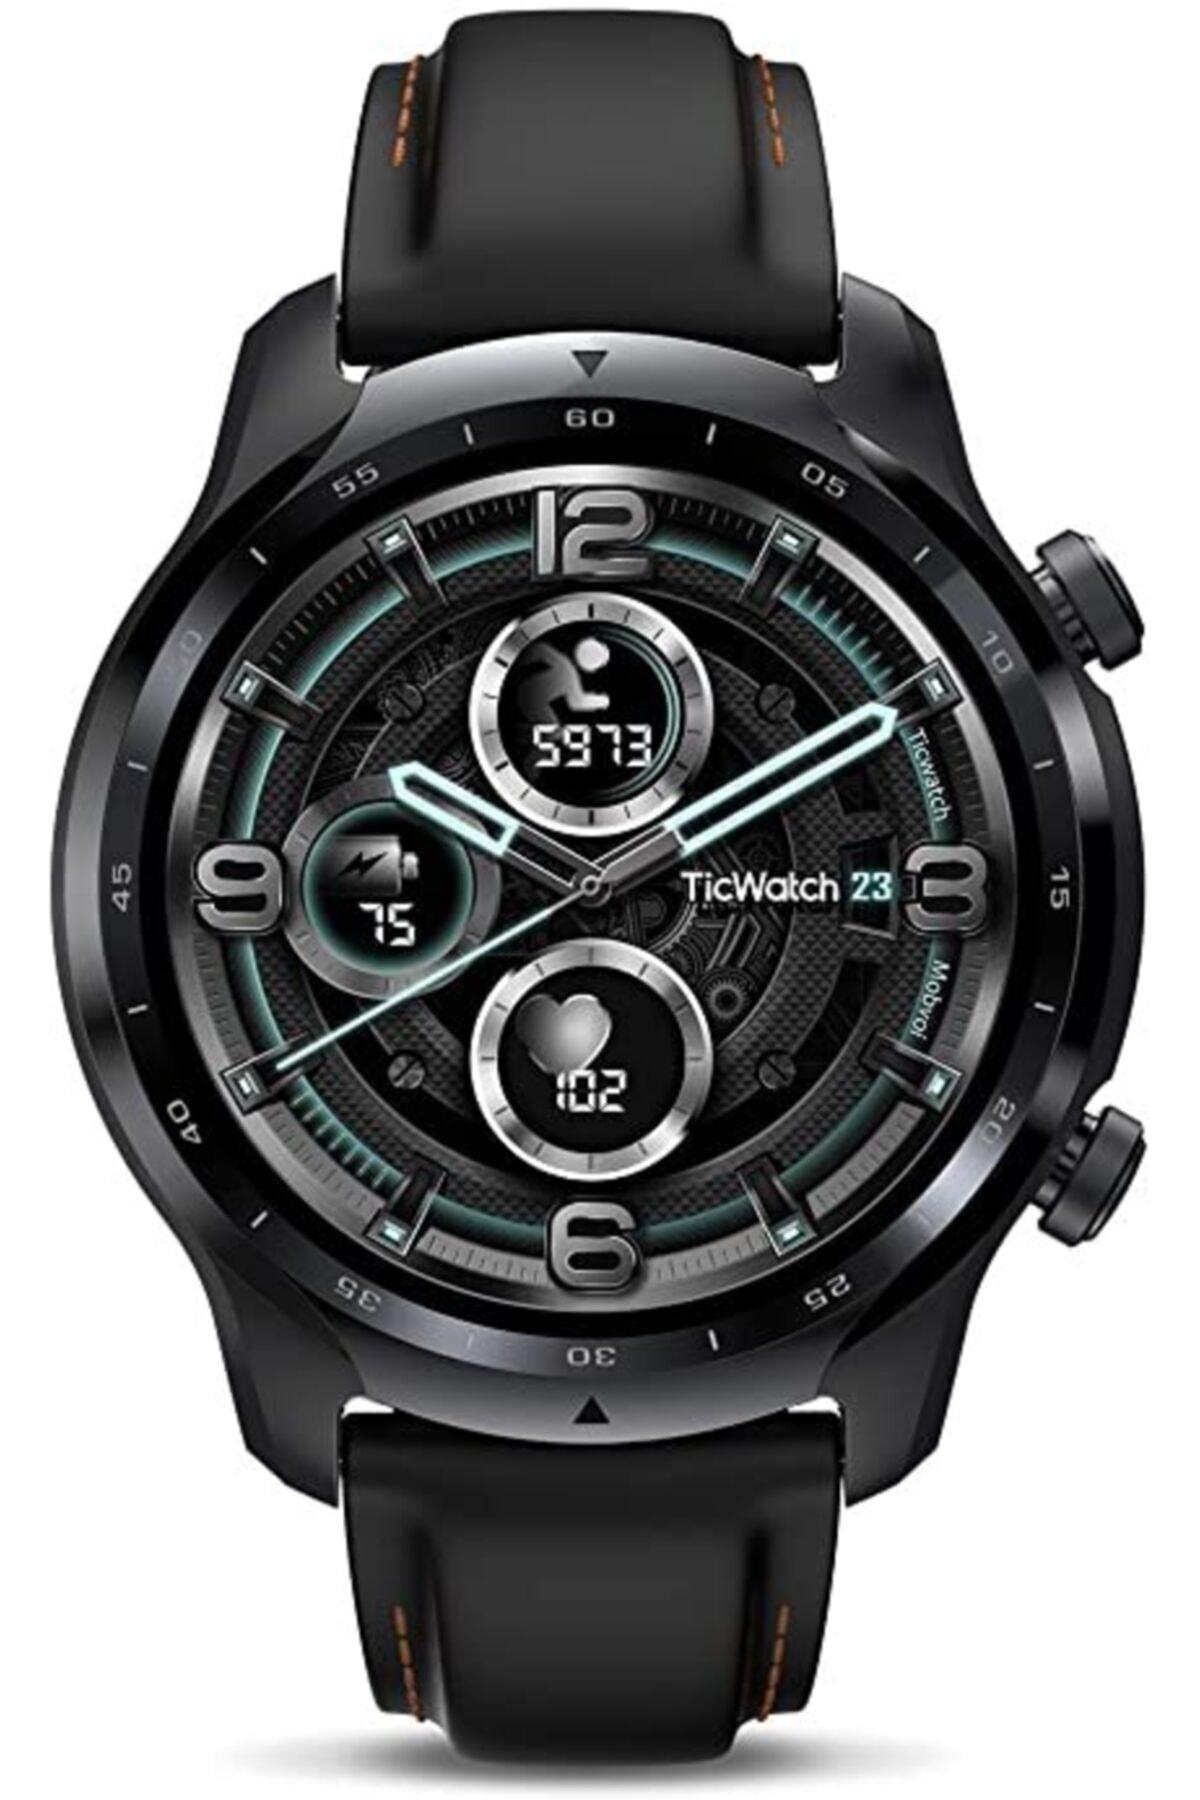 Ticwatch Pro 3 Gps Akıllı Saat,wearos ,snapdragon4100,çift Ekran,android Ios Nabızuykuspo2